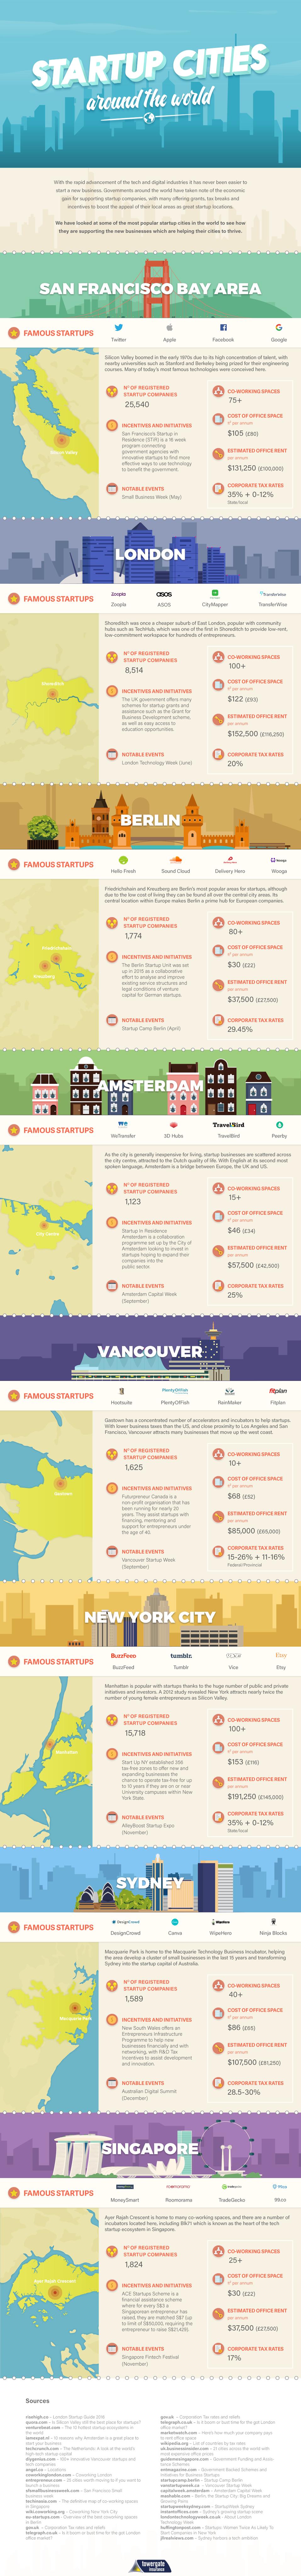 Startup cities